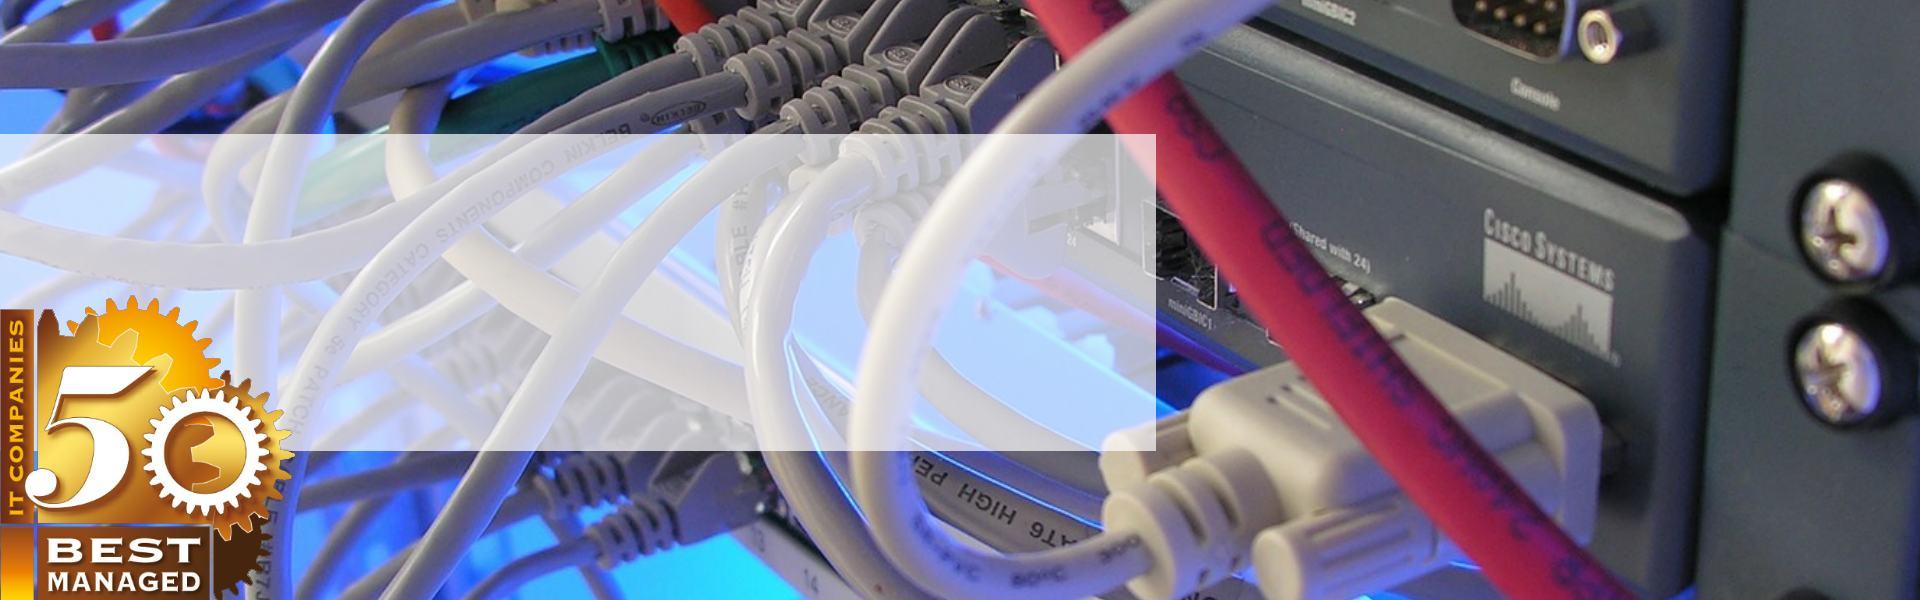 IT / Network Services Toronto